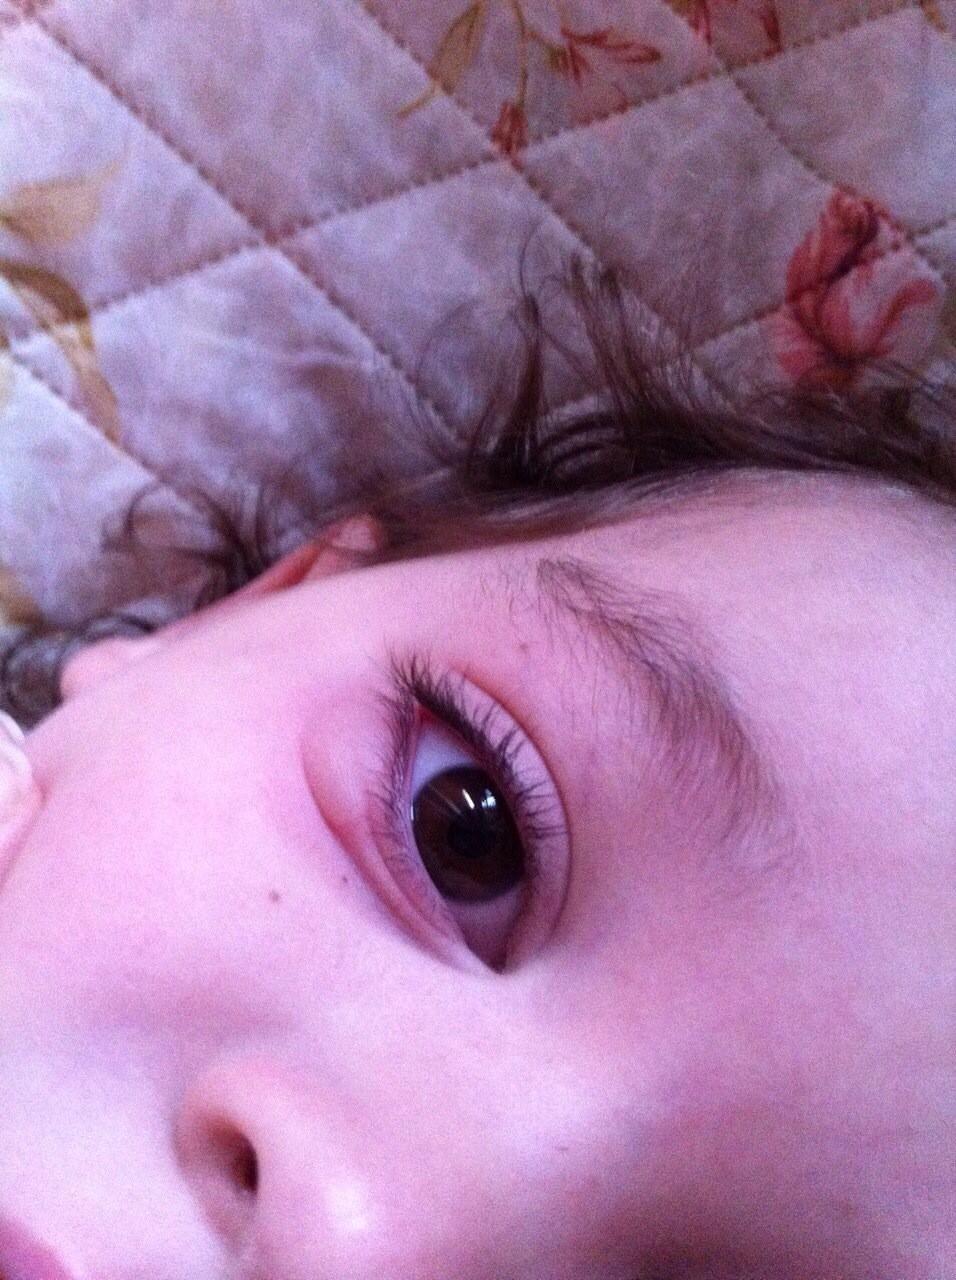 Фото опухоли глаз у ребенка